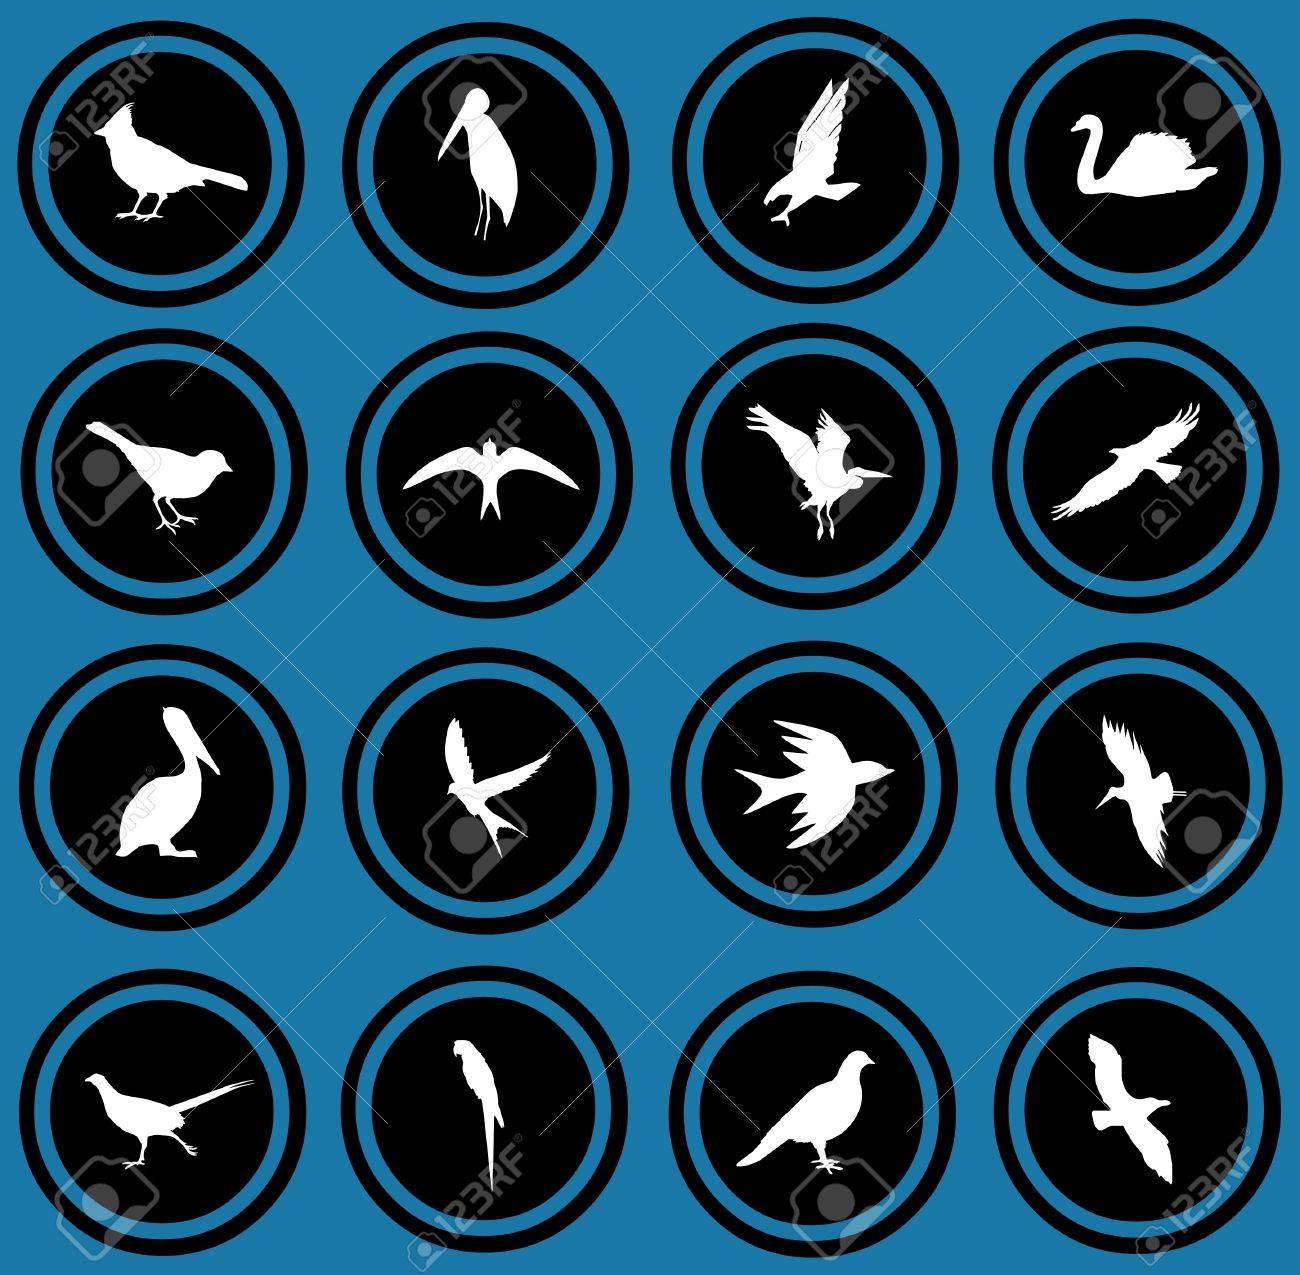 silhouettes of birds  birrds icons Stock Photo - 12836299